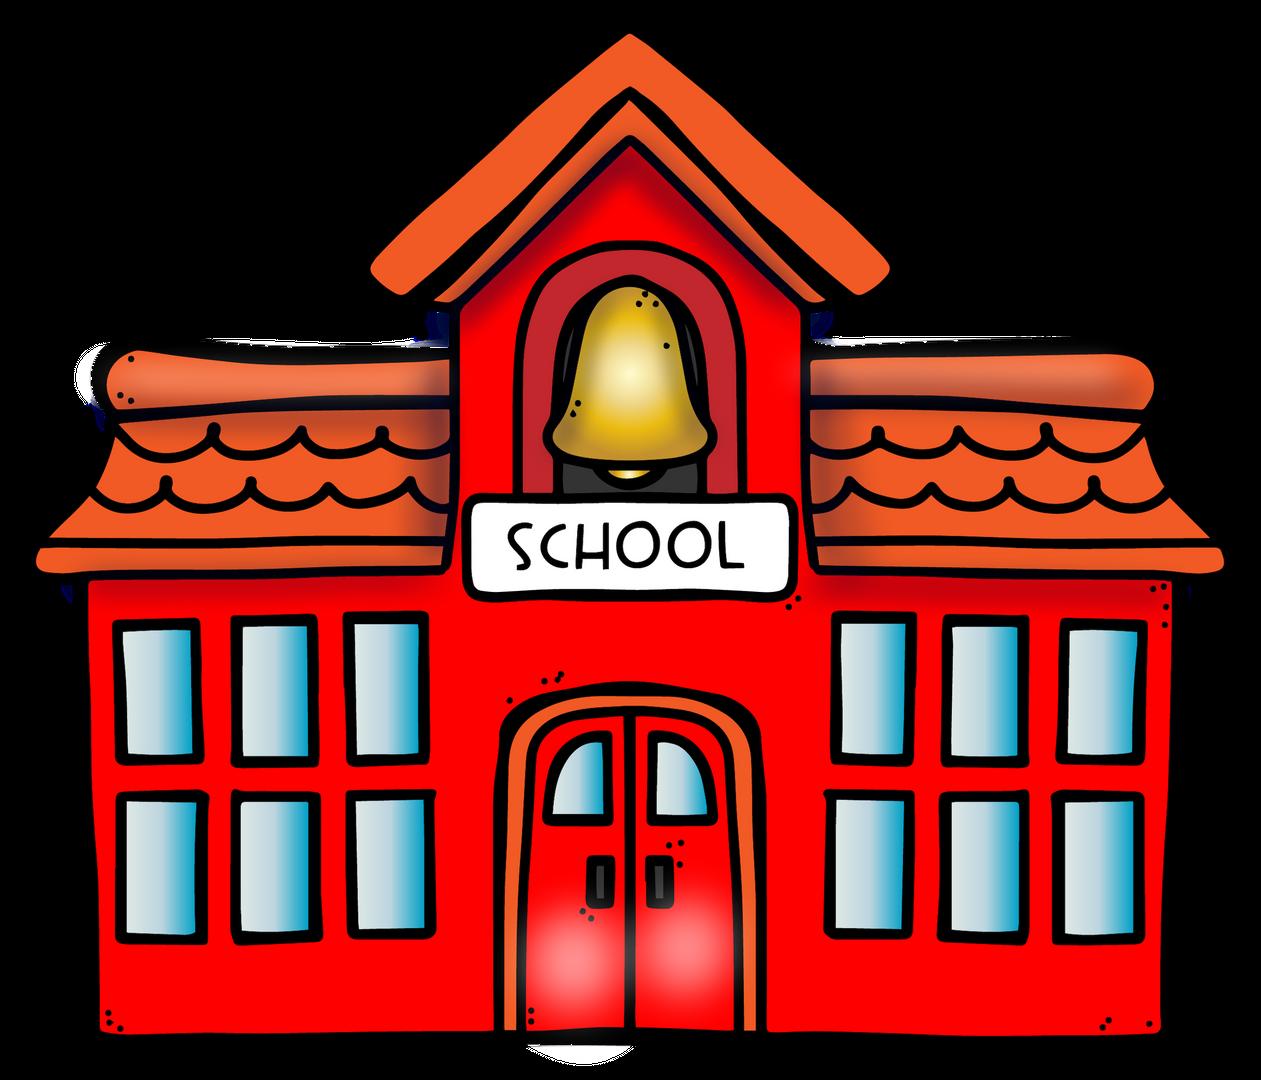 cartoon image of schoolhouse